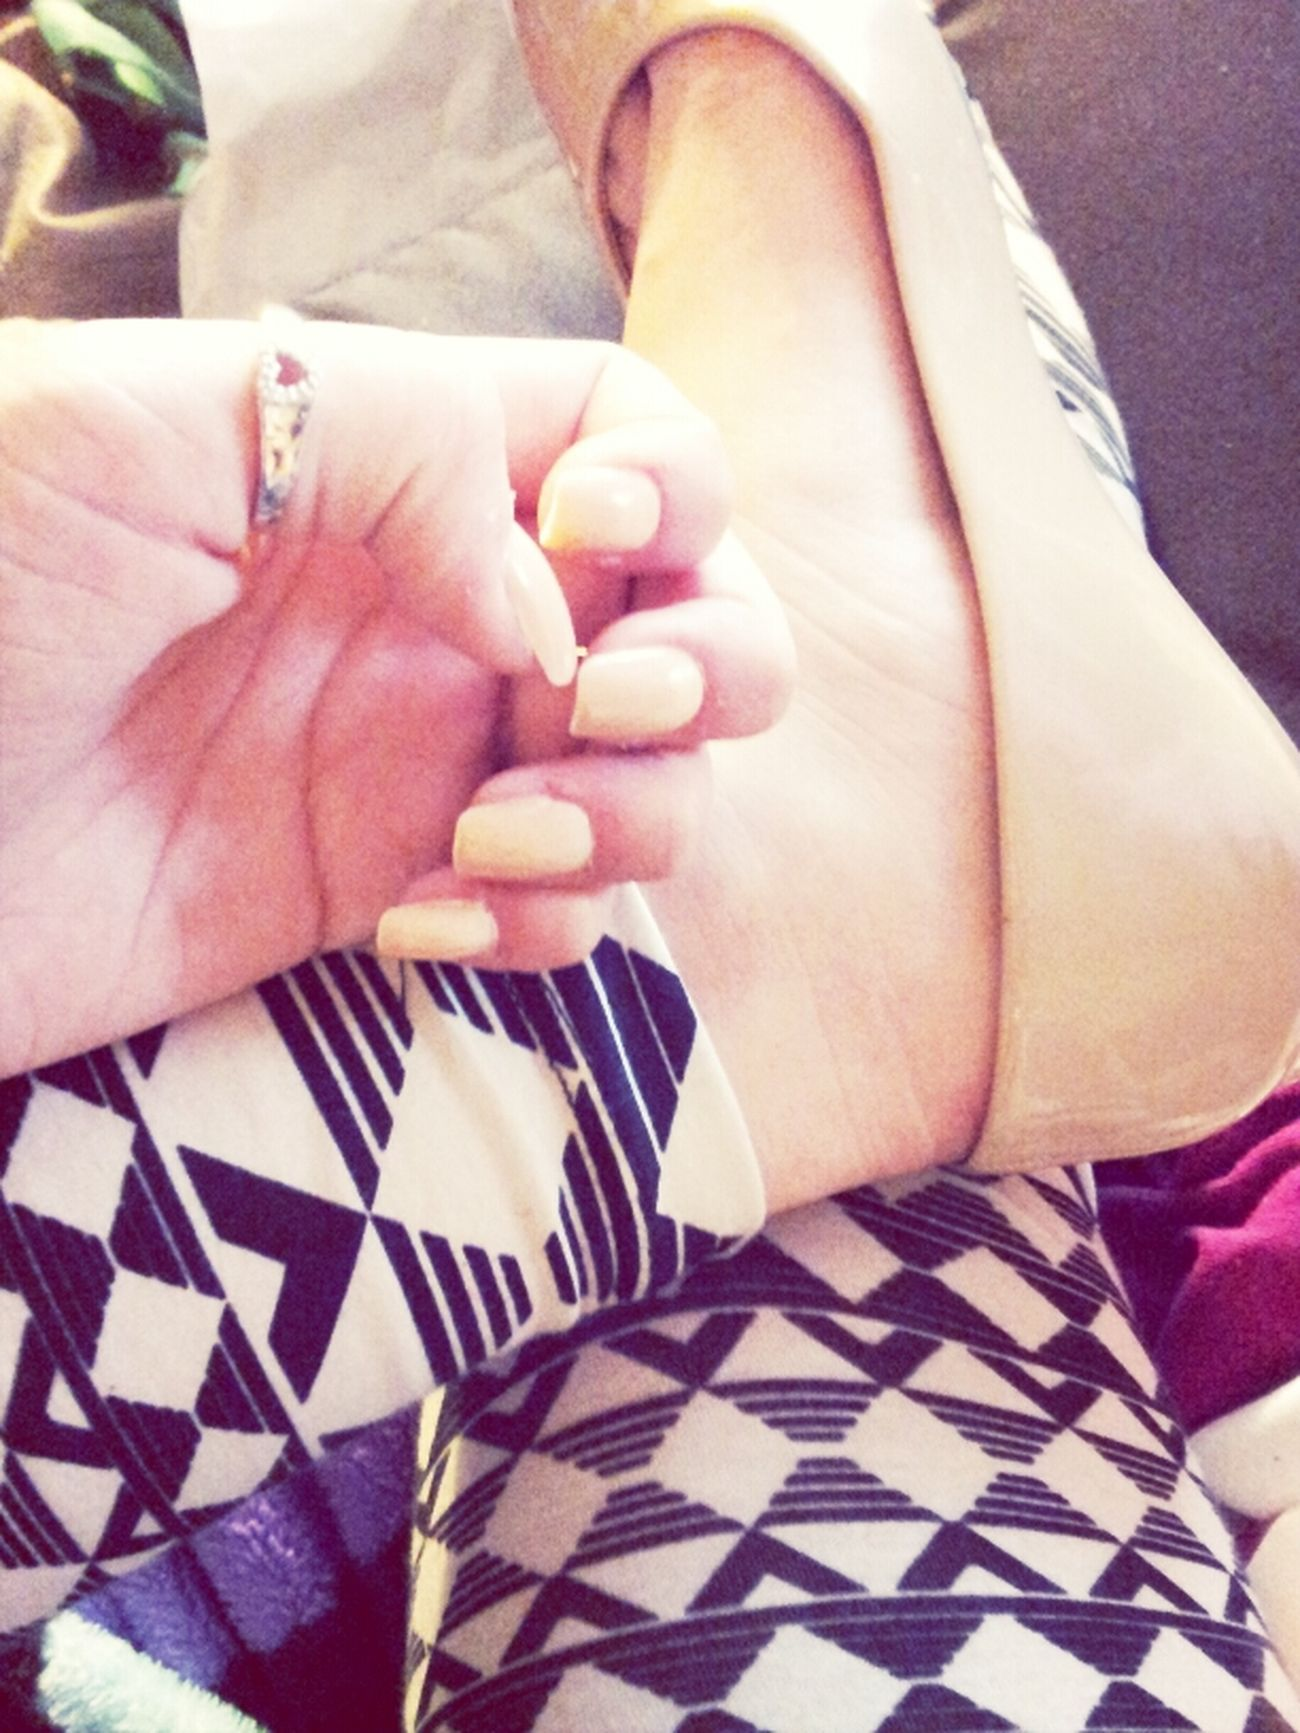 Tribal Leggings Neud Nails Neud Flats Patterned Leggings